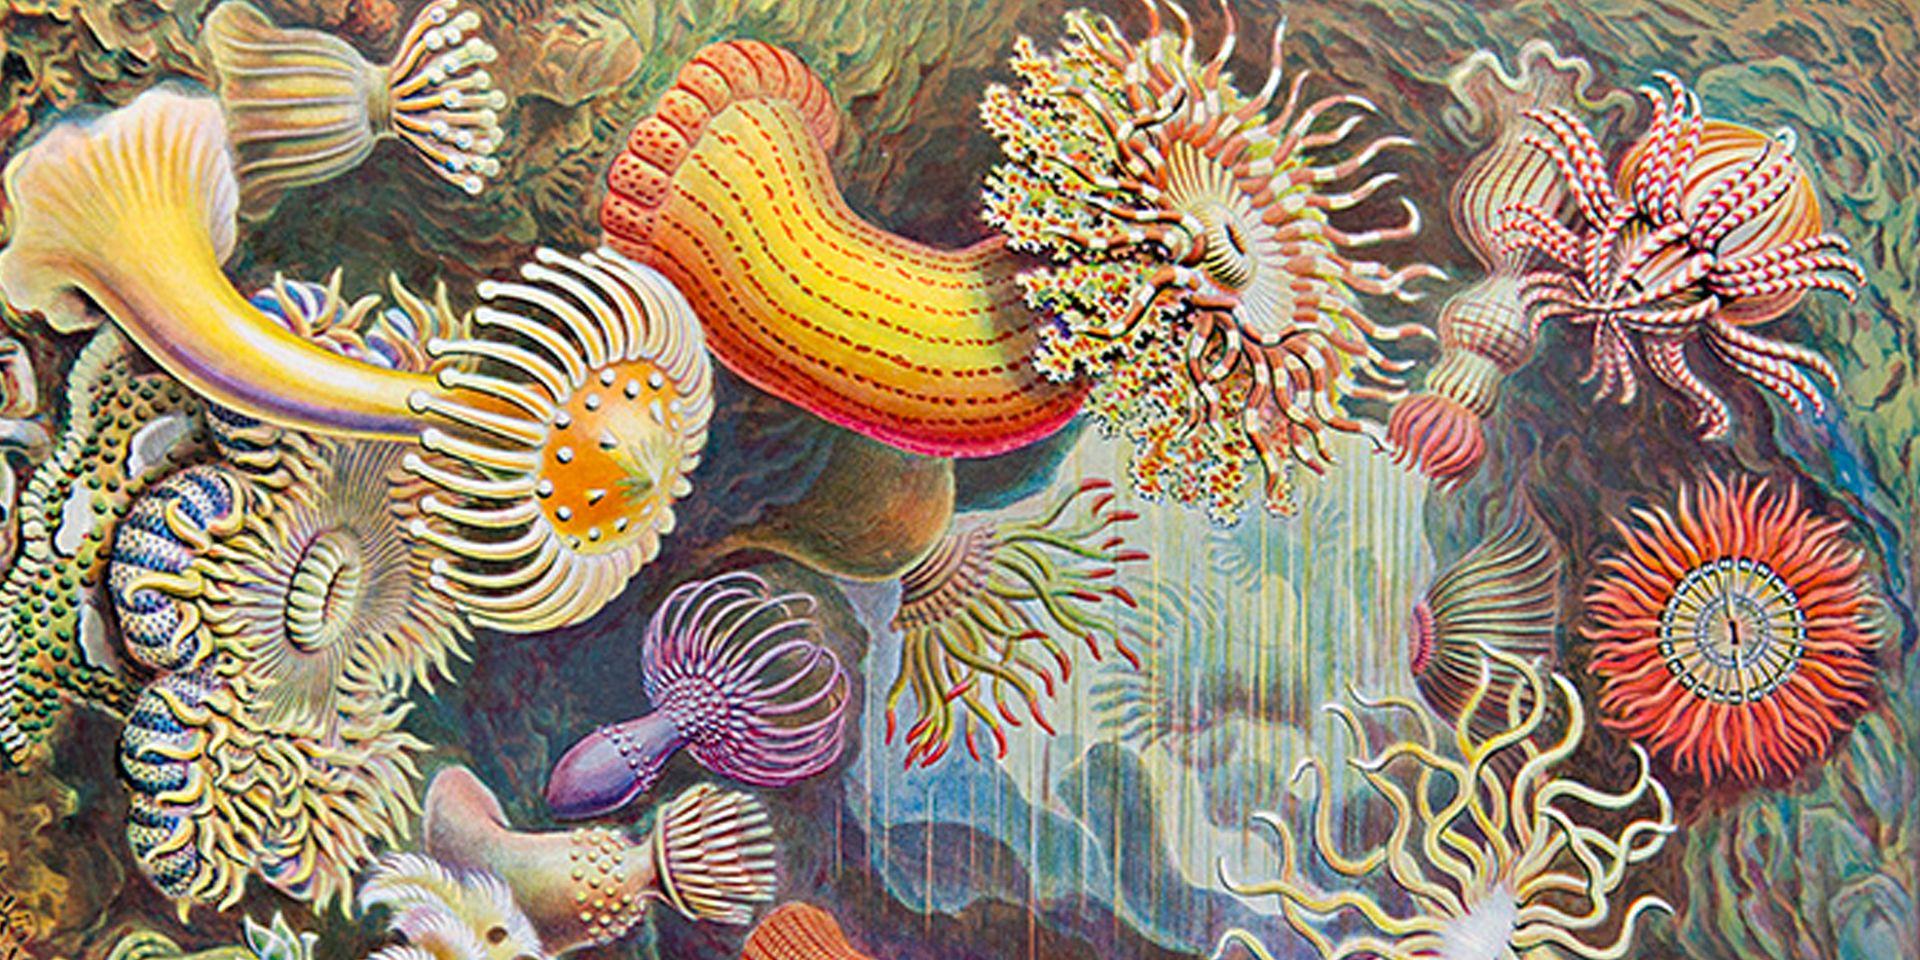 Pin On Dissertation Topics Marine Biology Ideas